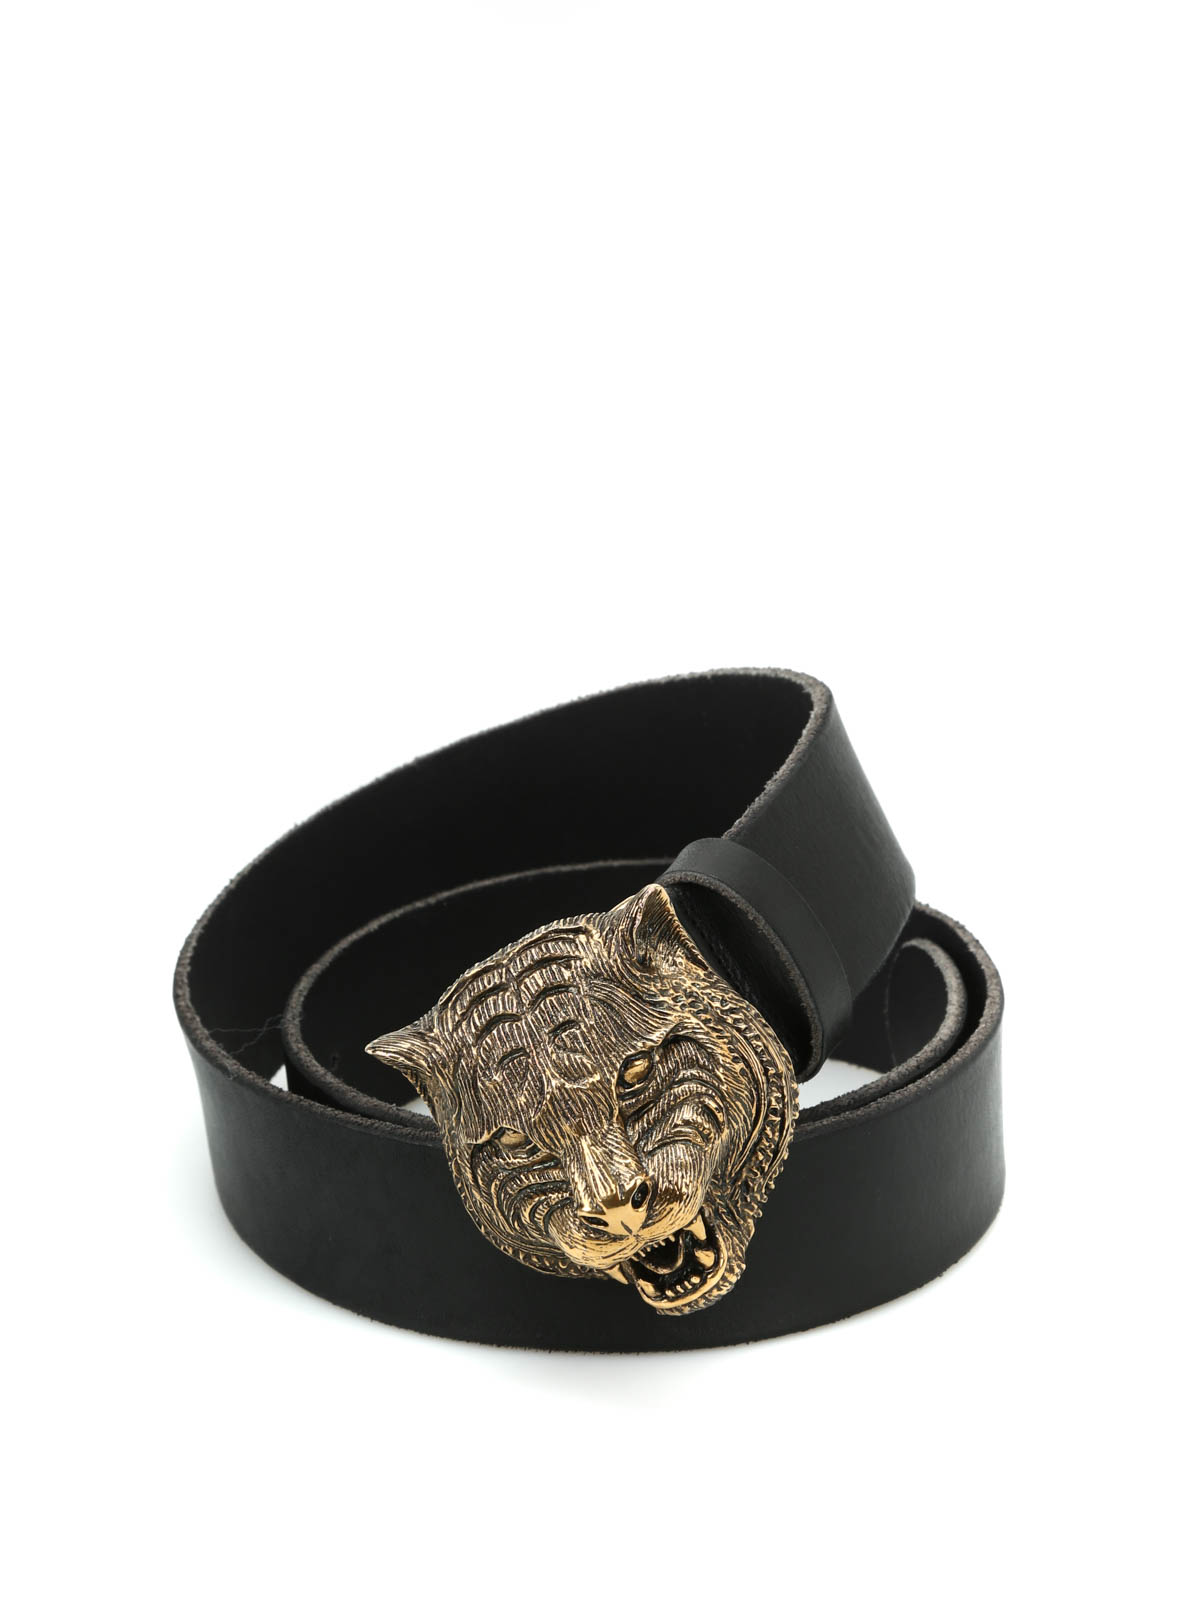 Gucci - Feline buckle leather belt - belts - 409420 CVE0T ...